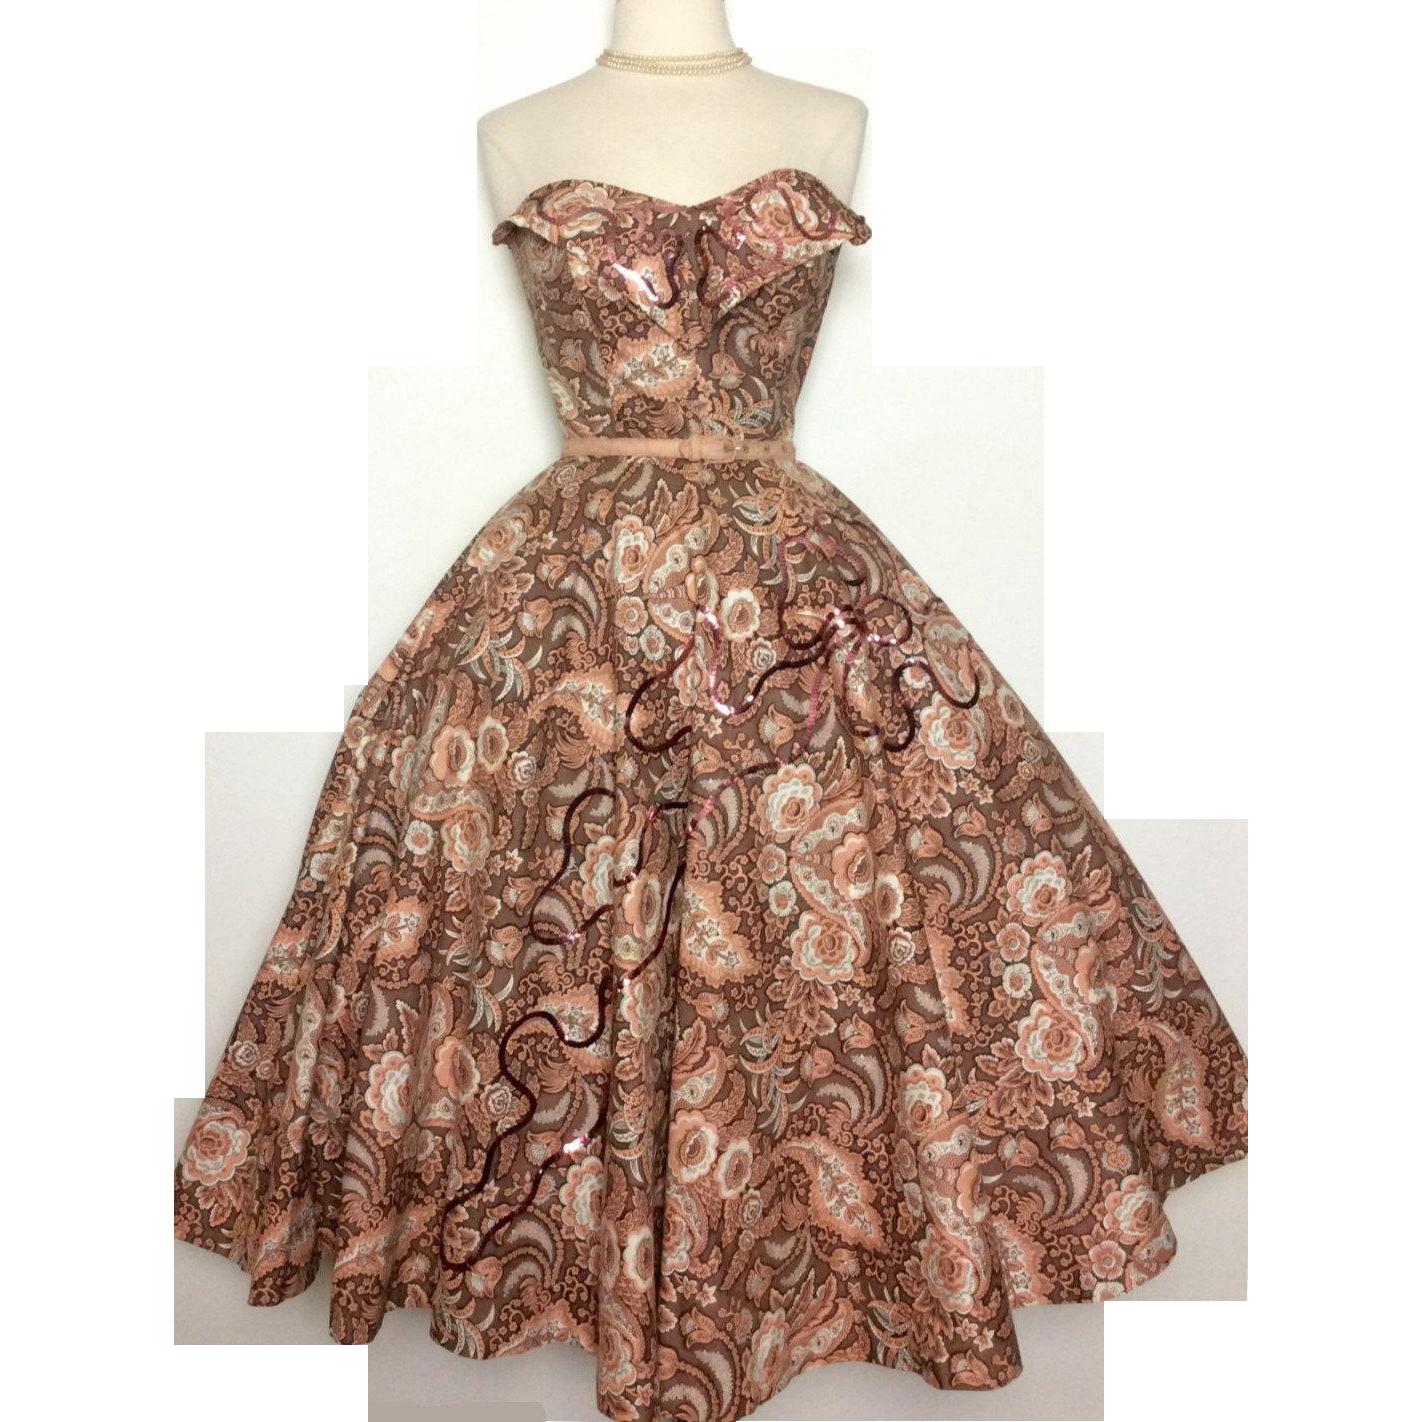 Dress//50s Strapless Dress//Floral